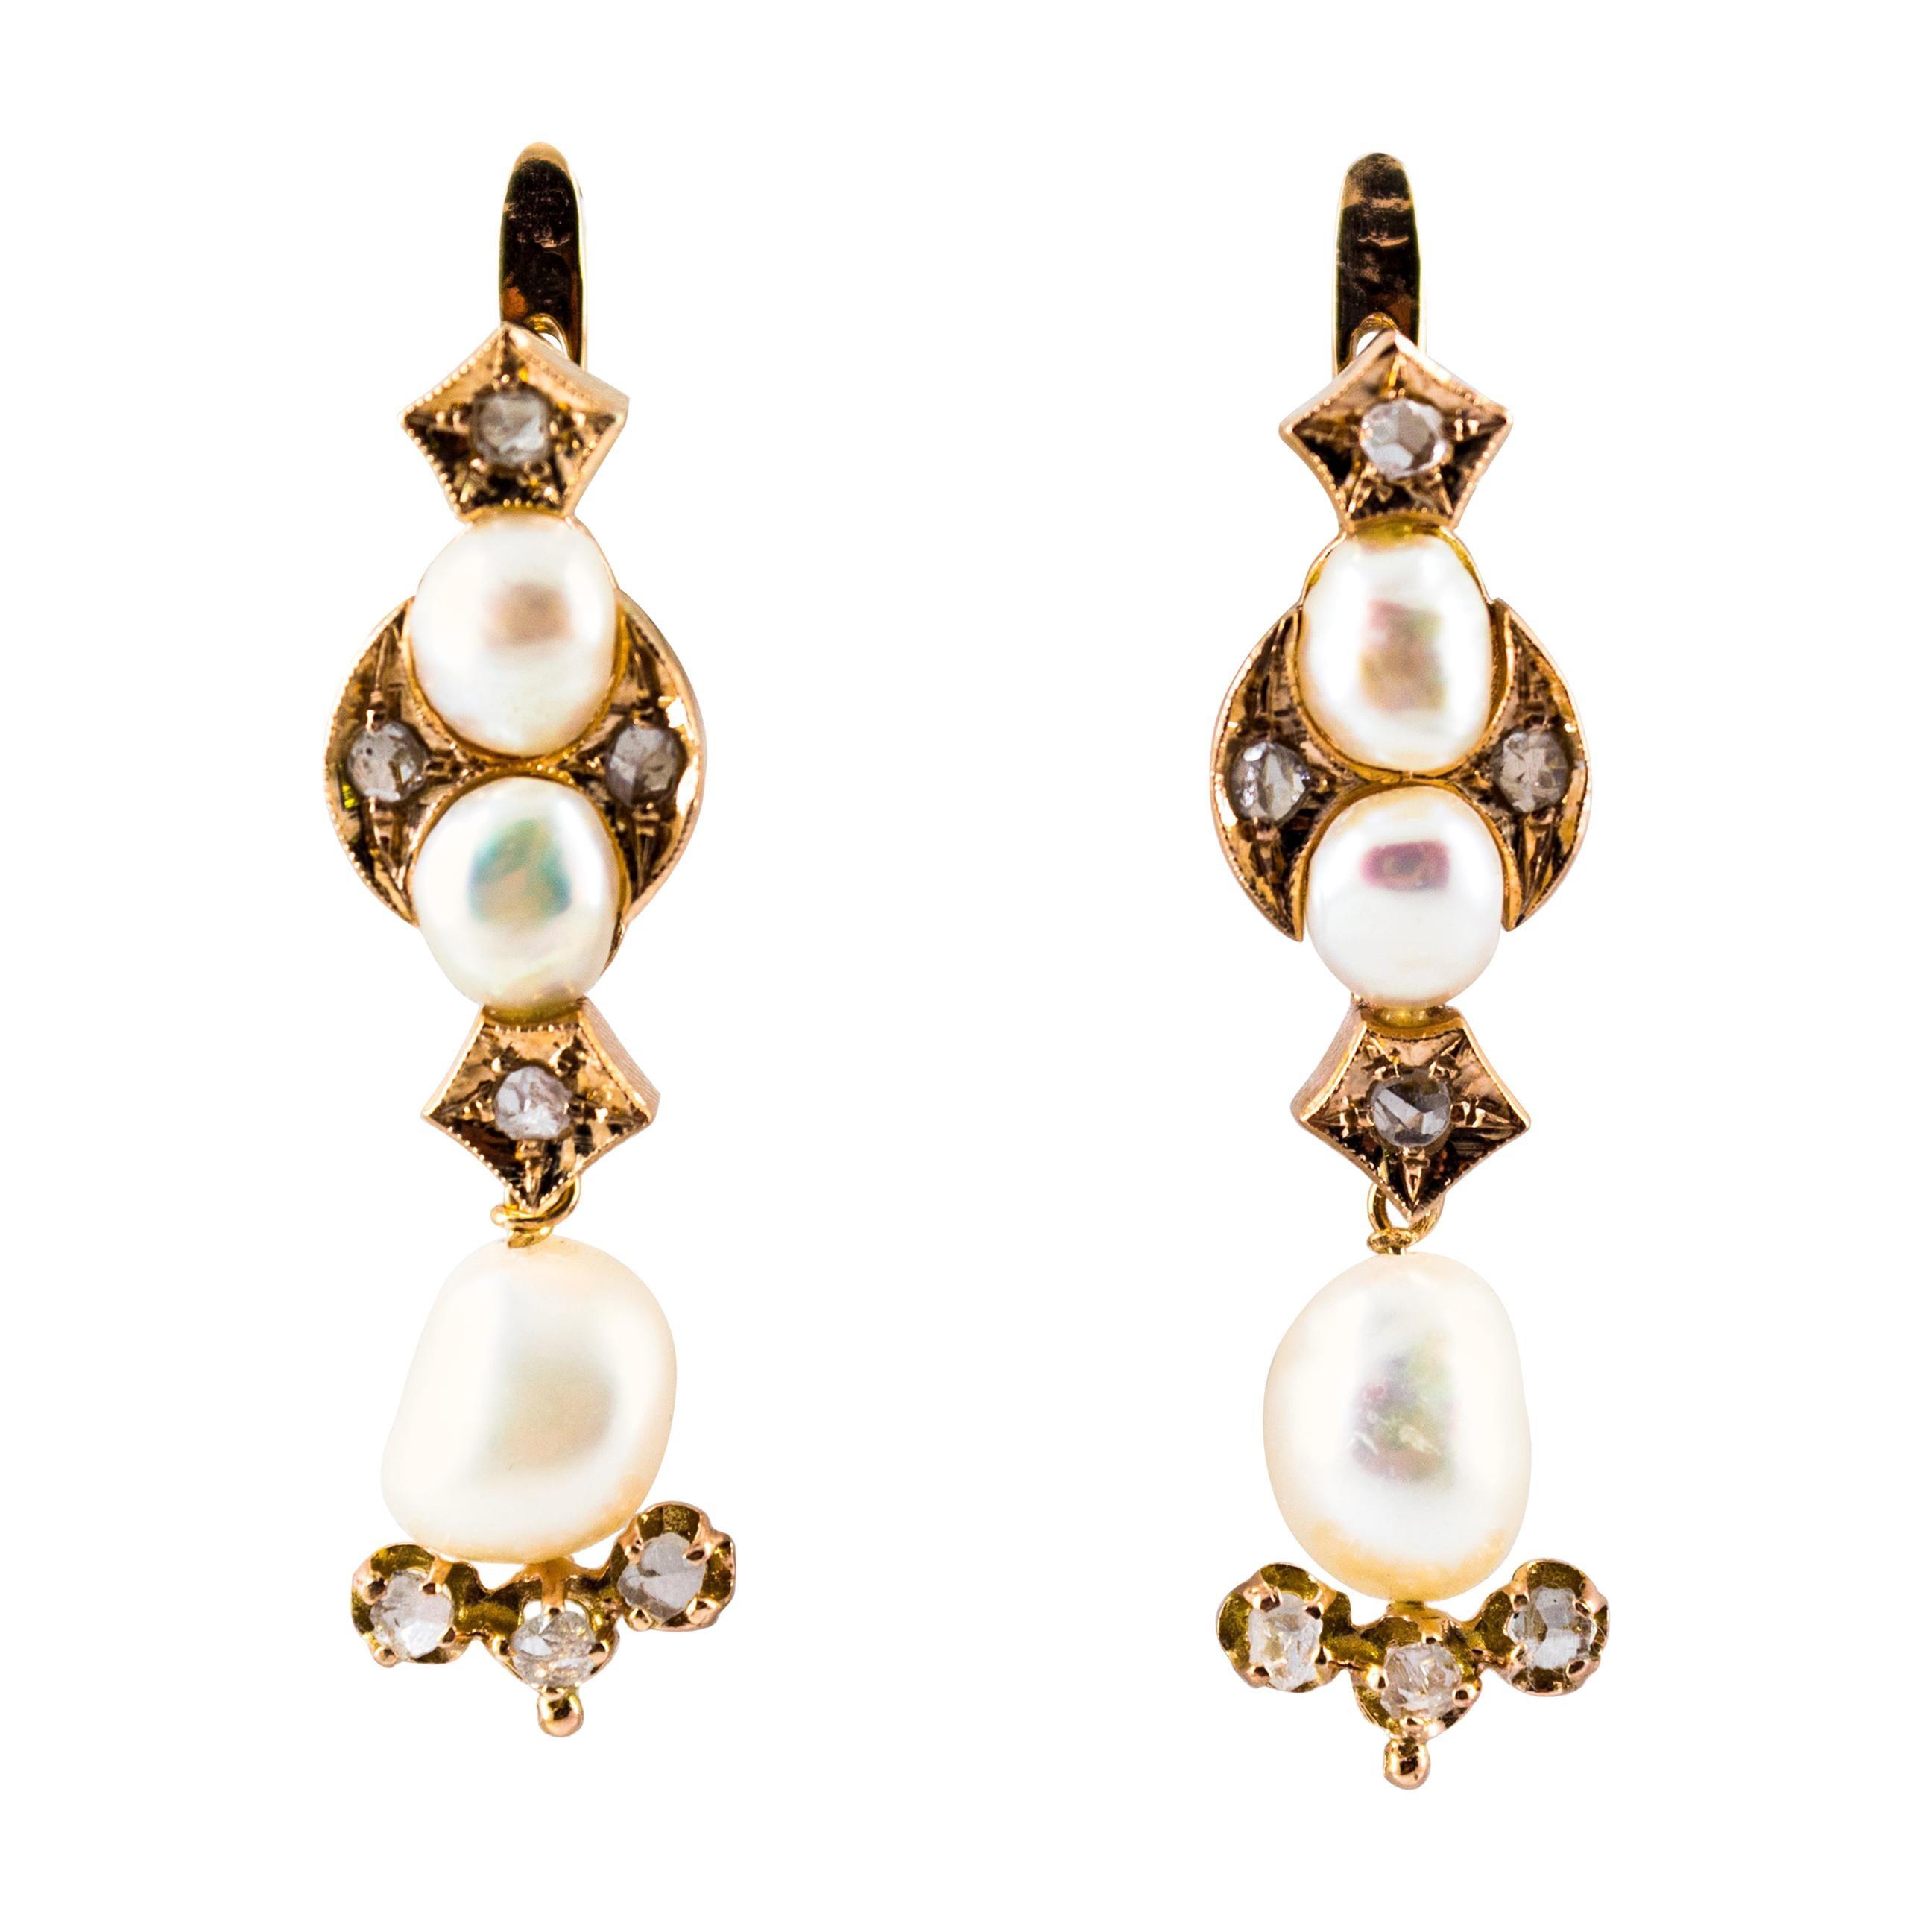 0.65 Carat White Rose Cut Diamond Pearl Yellow Gold Lever-Back Drop Earrings